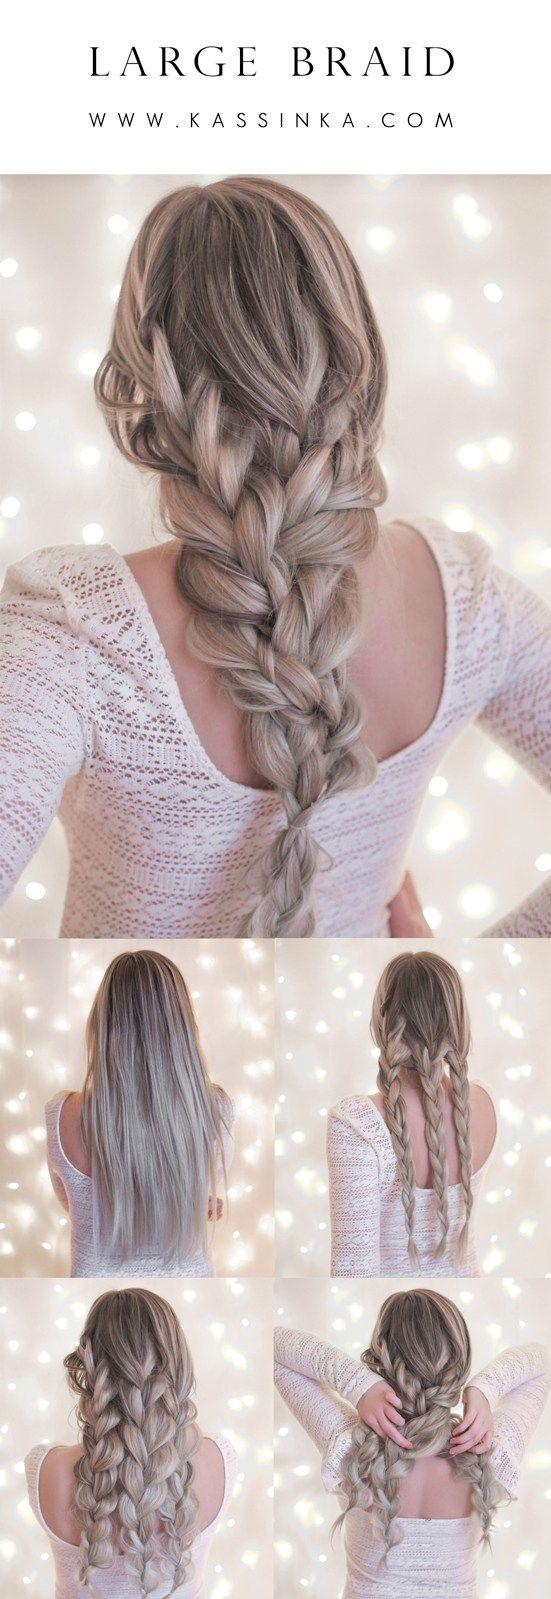 Kassinka hair tutorial cabello y belleza pinterest tutorials